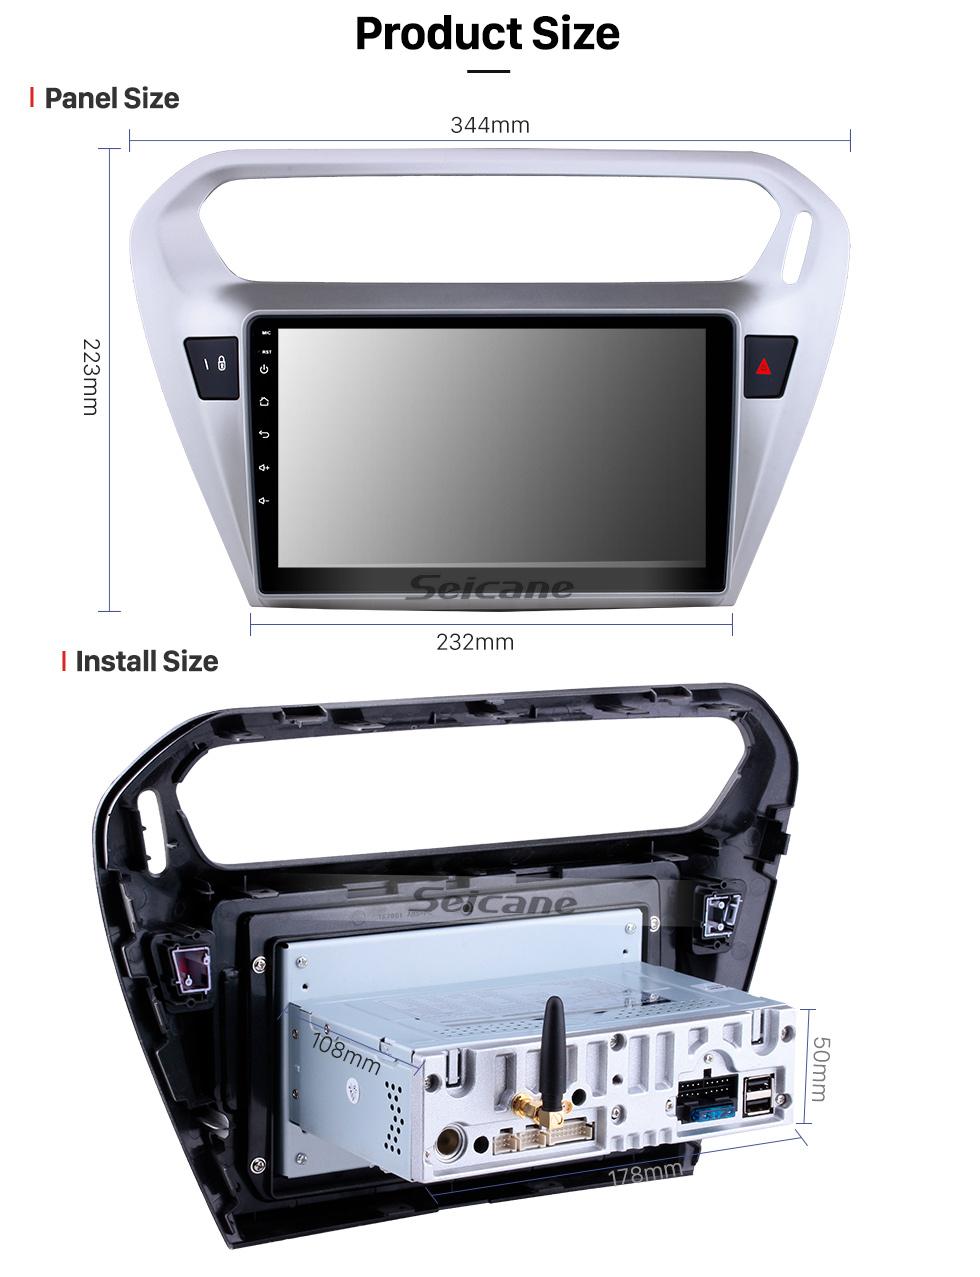 Seicane 9 pulgadas 2013 2014 Peugeot 301 Citroen Elysee Citroen C-Elysee Android 9.0 Radio GPS HD 1024 * 600 Pantalla táctil 4G WIFI Volante OBD2 RDS Control Mirror Link Bluetooth